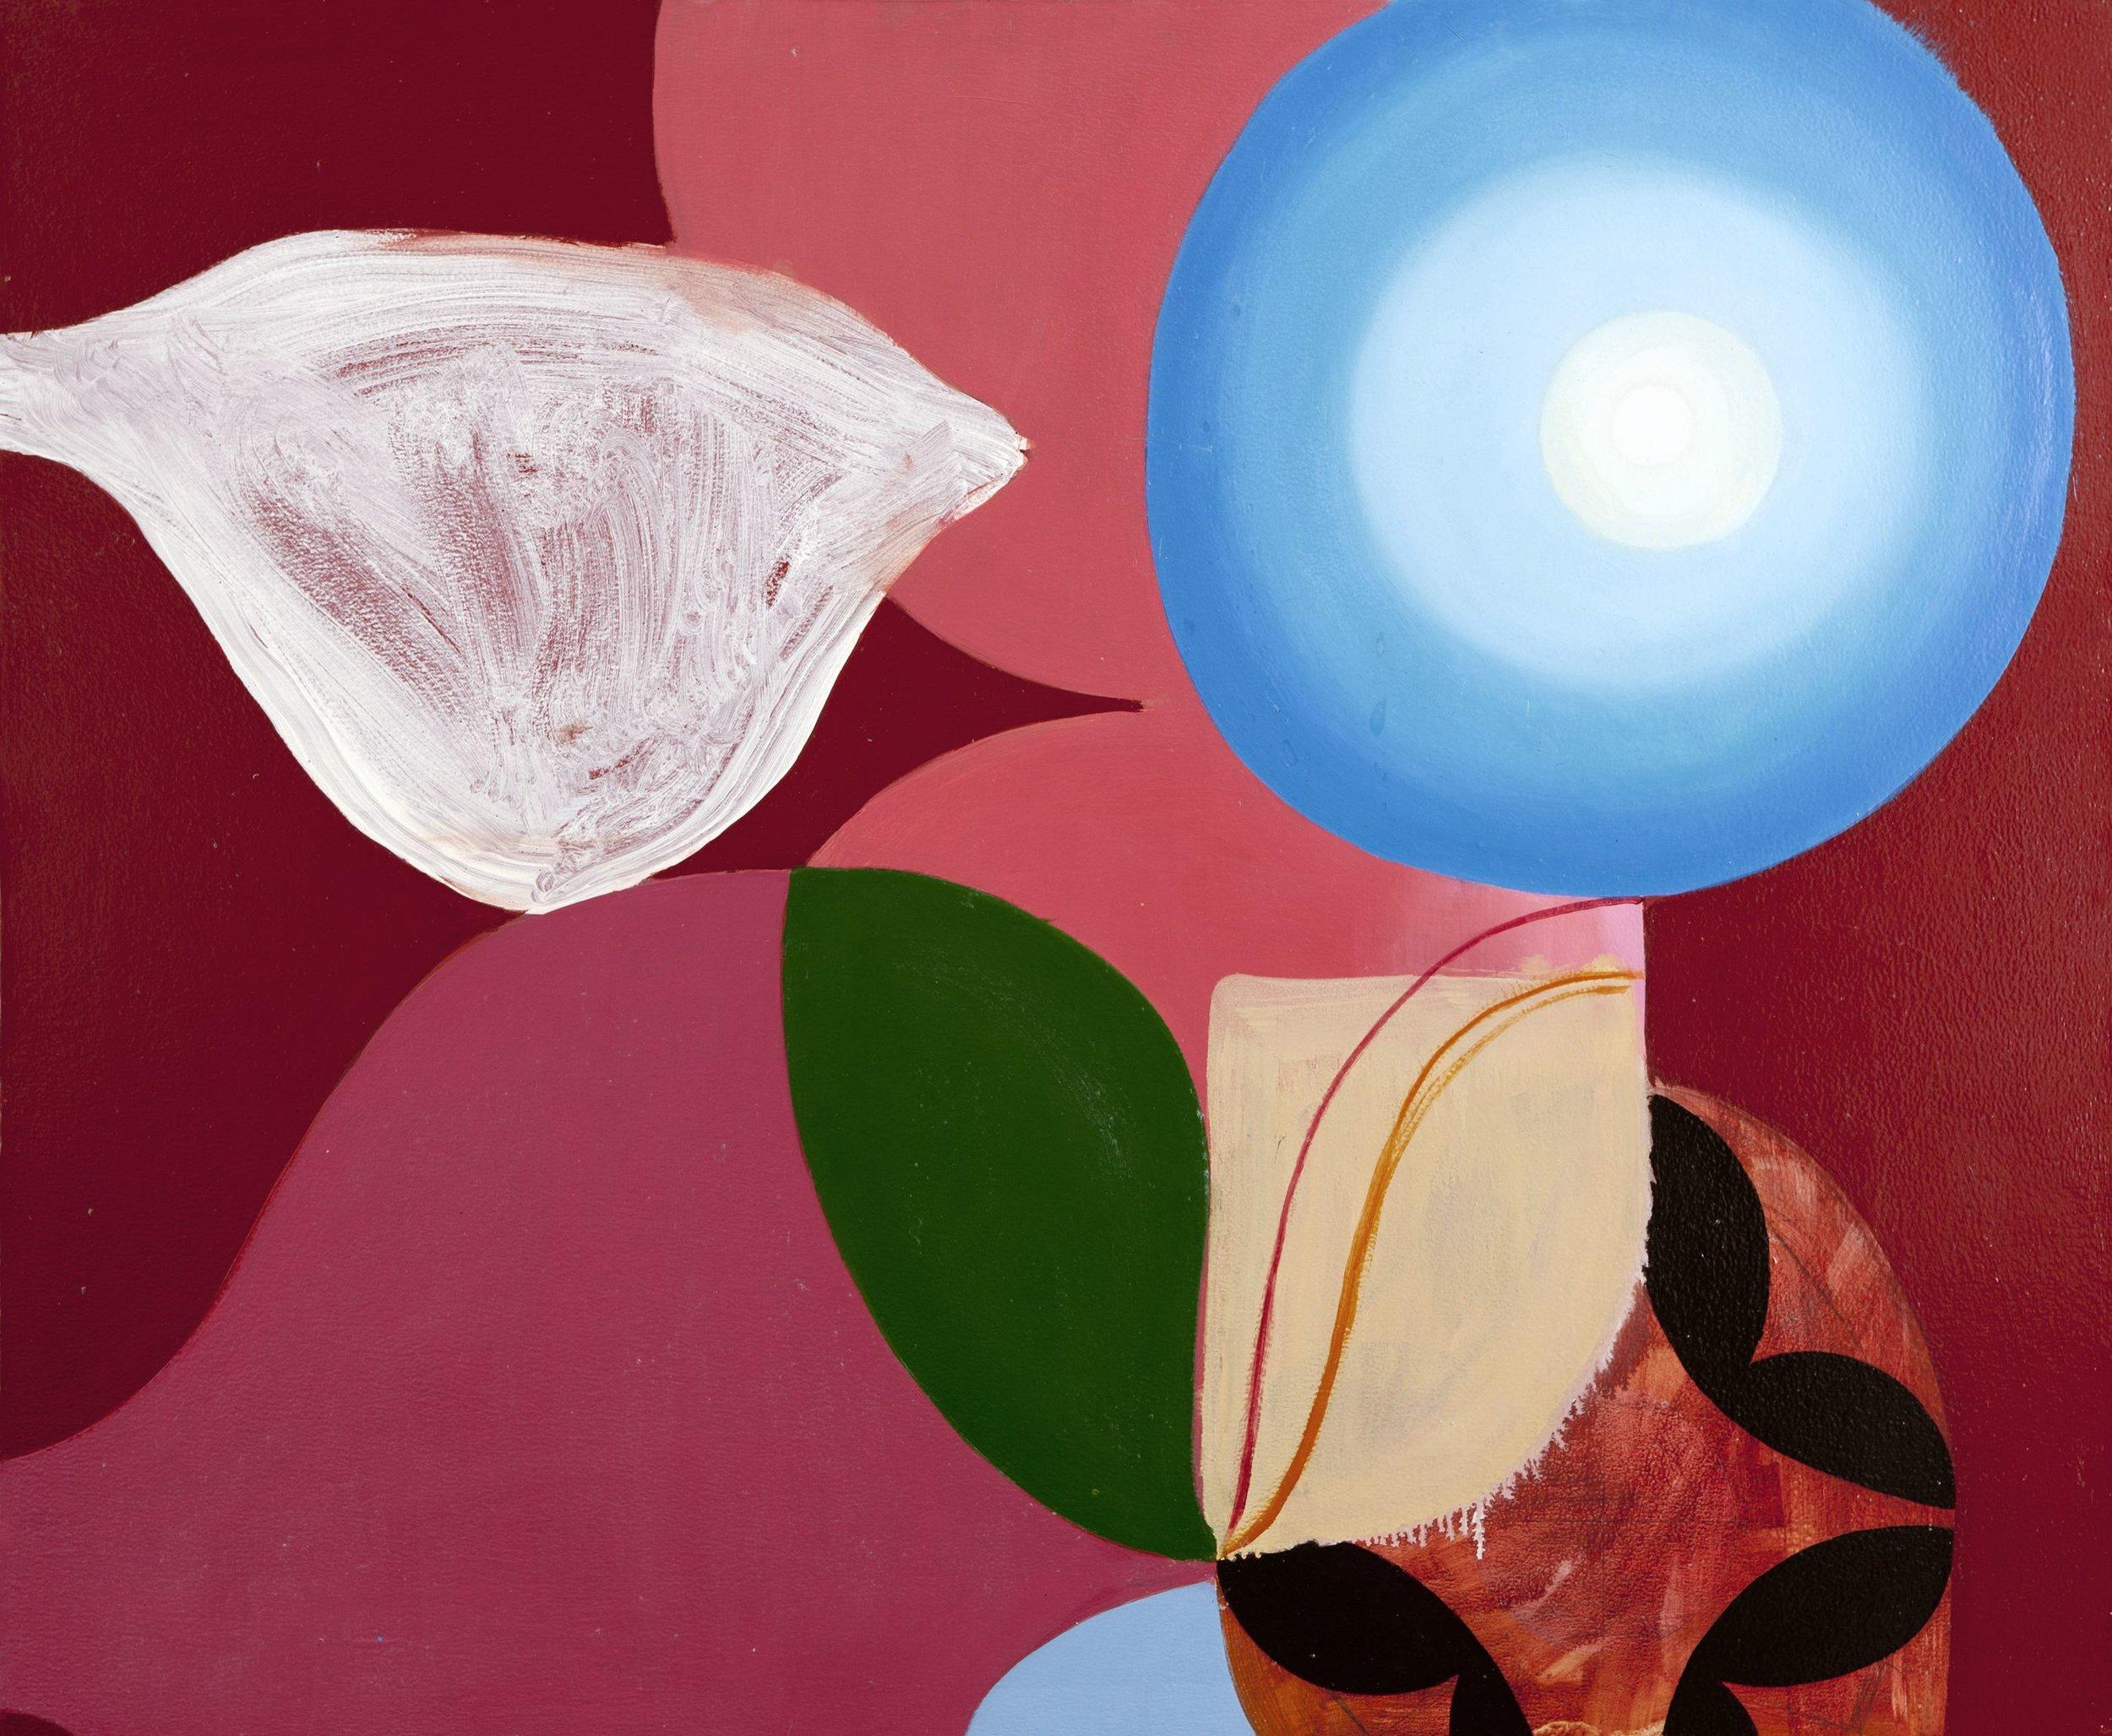 Bryan Osburn,    Blue Sun , 2011, Oil on canvas, 33 x 40 inches, (83.8 x 101.6 cm).